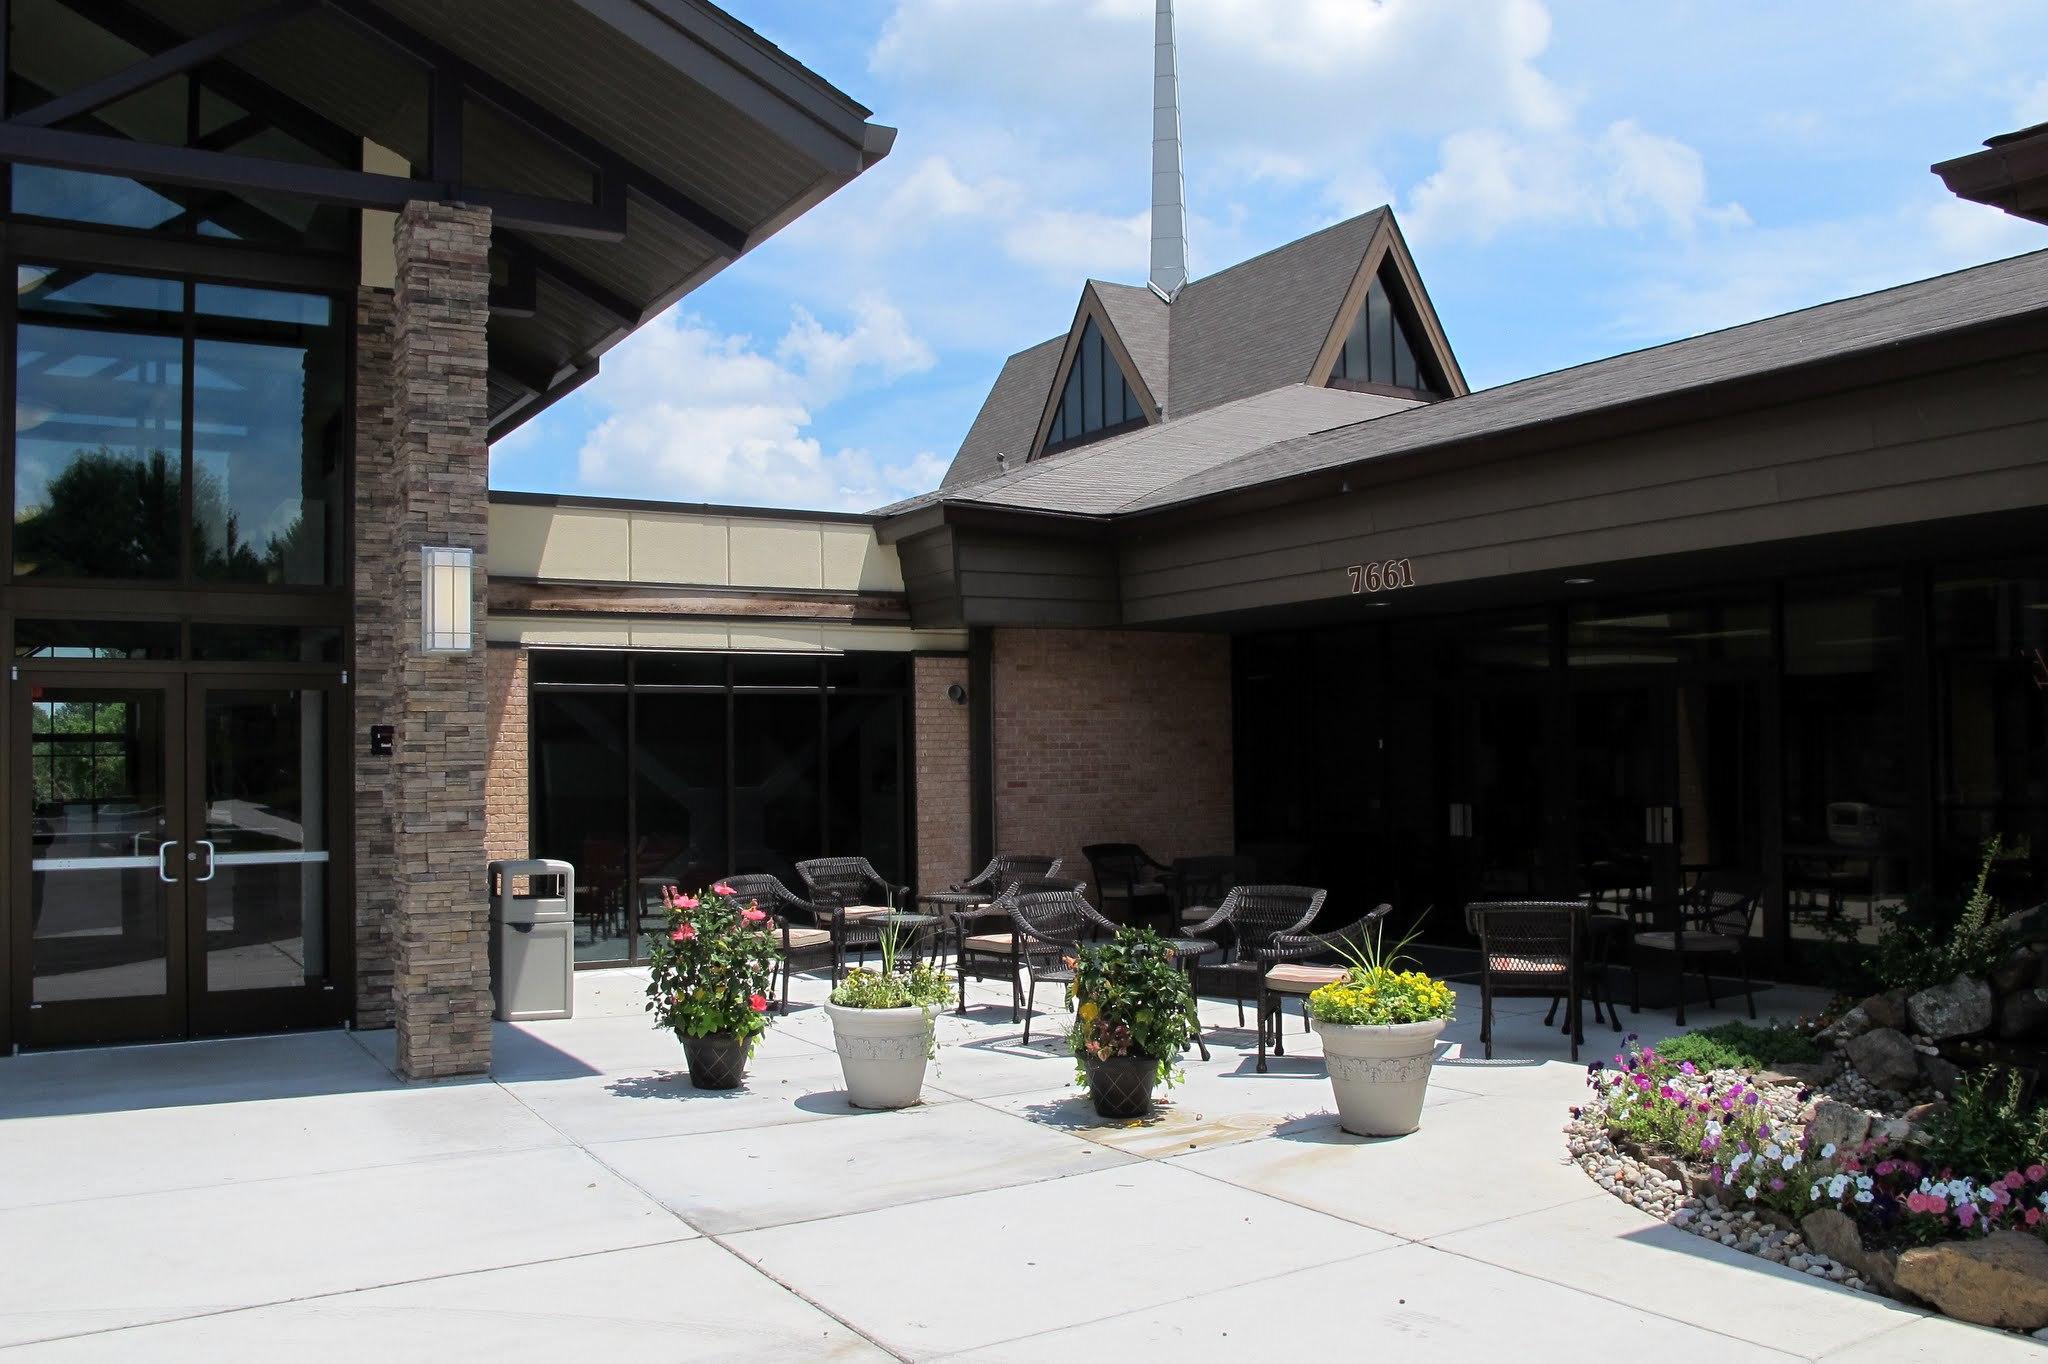 grace community chapel church outdoor cafe.JPG